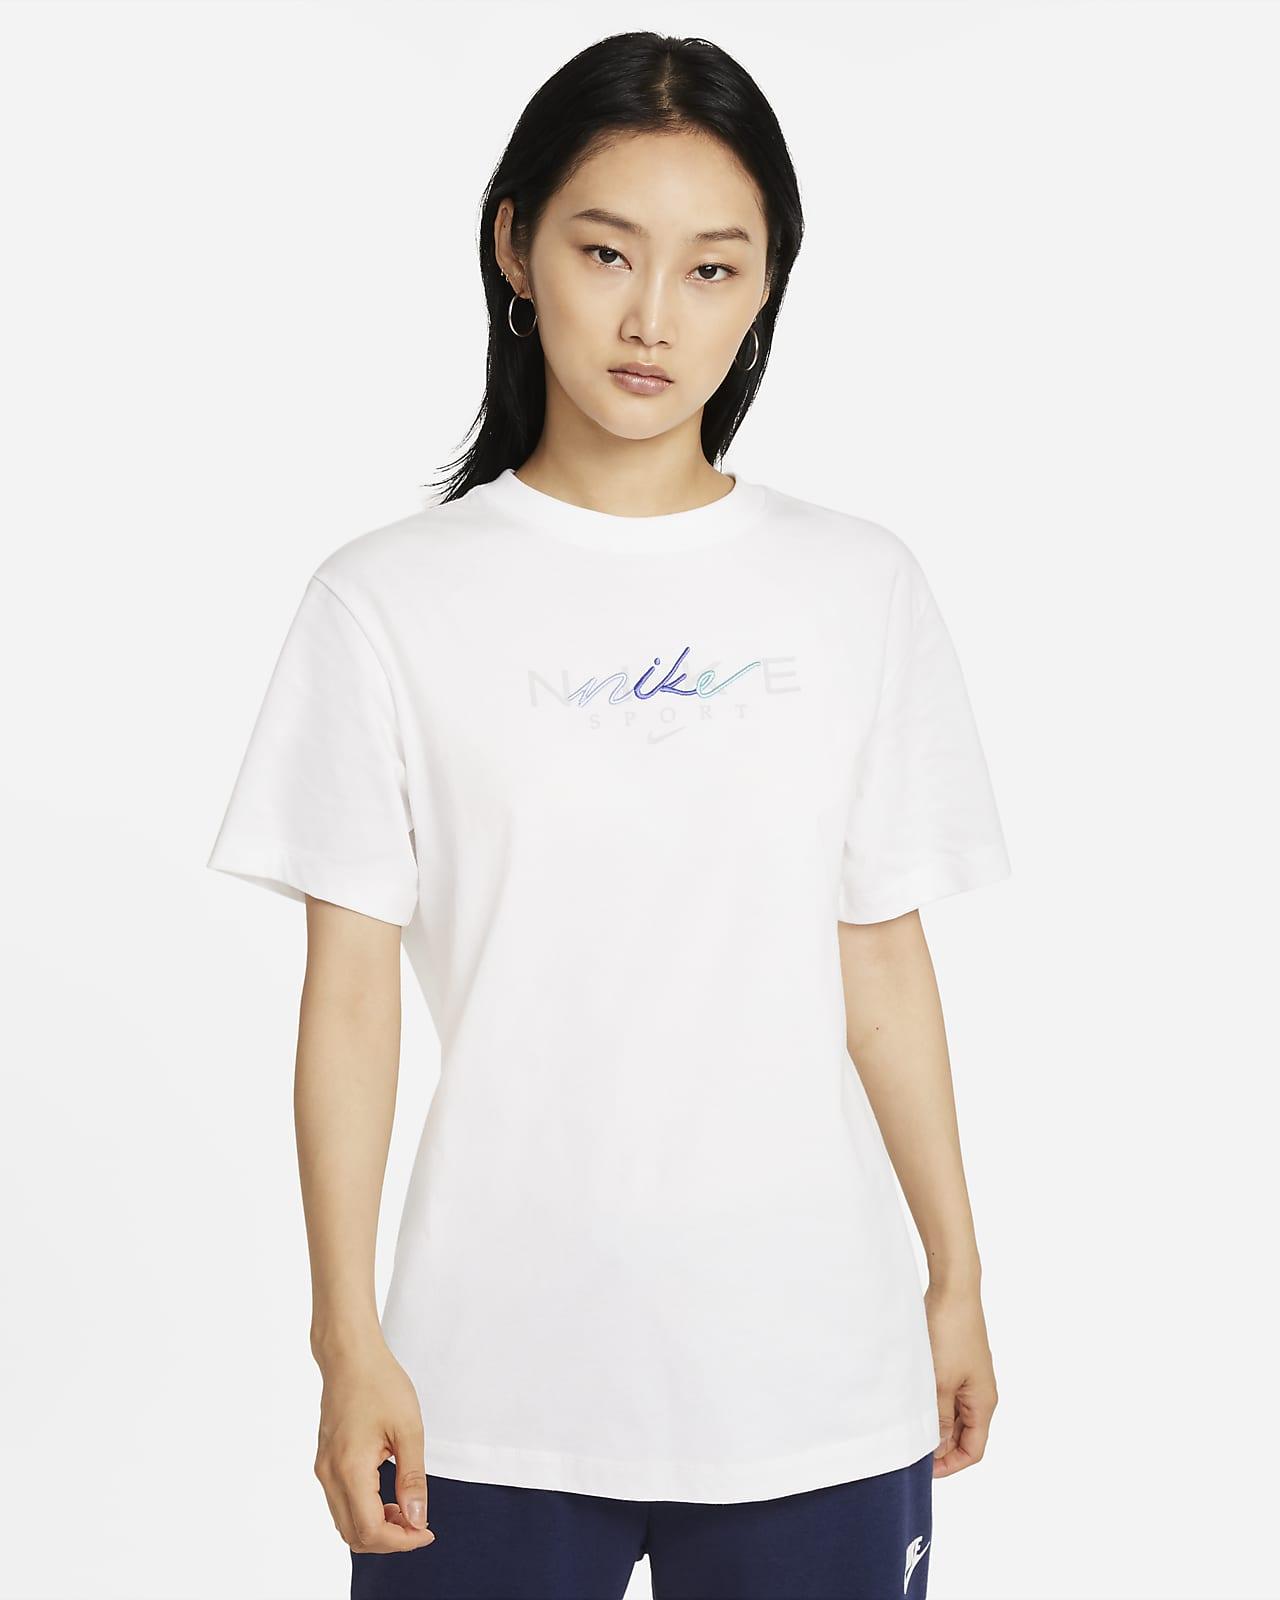 Nike Sportswear 女款男友版 T 恤